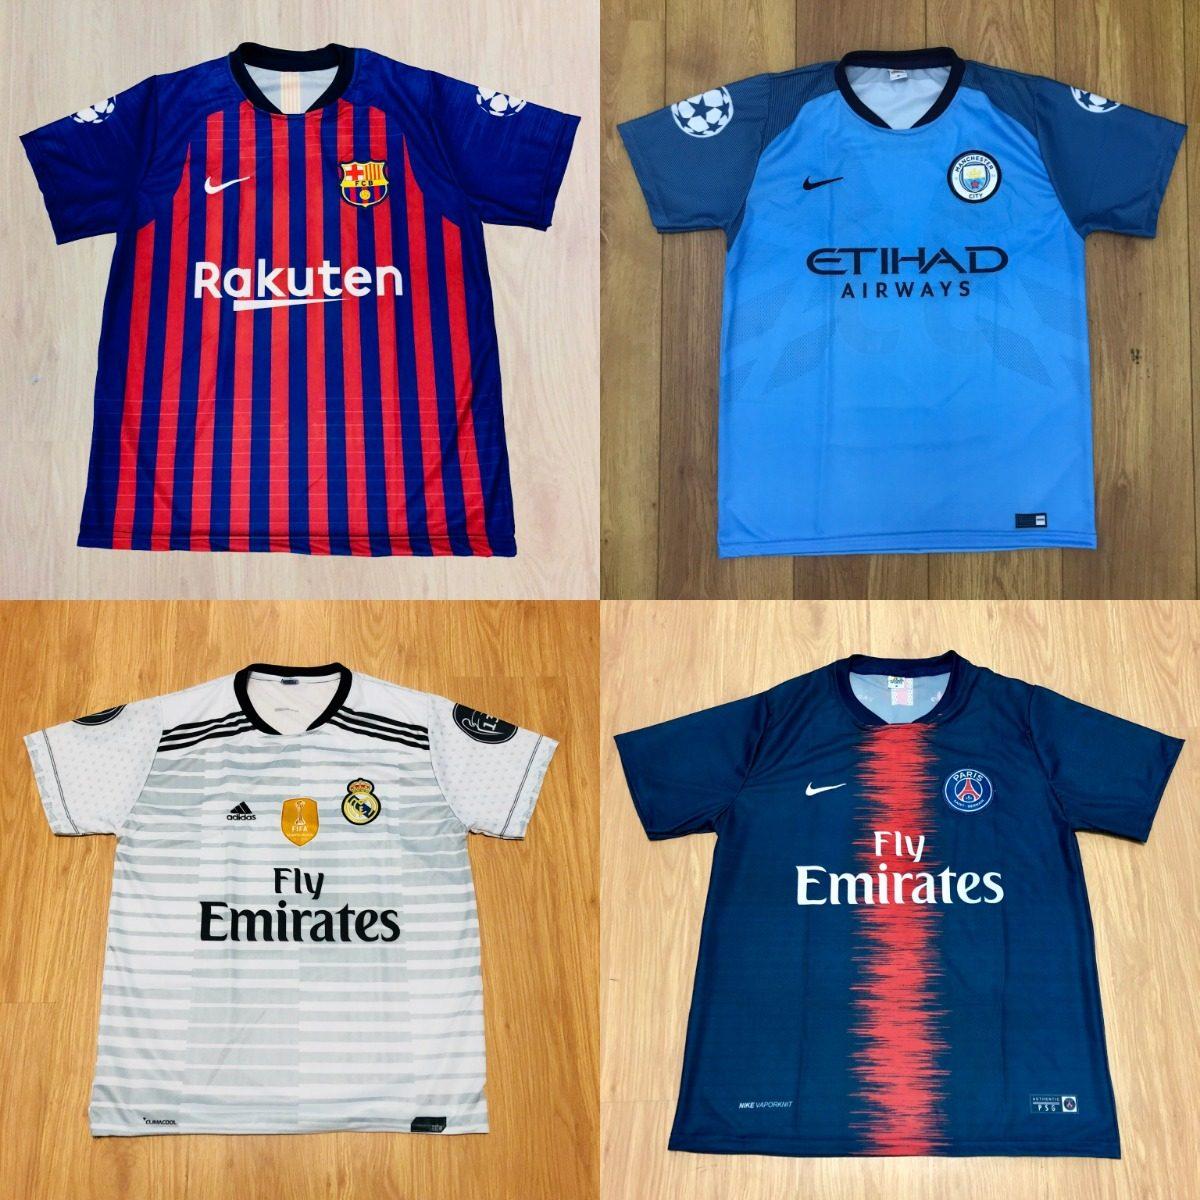 Kit 7 Camisetas De Time Atacado Futebol 100 Modelos 2018 - R  147 3b0b3b621af68